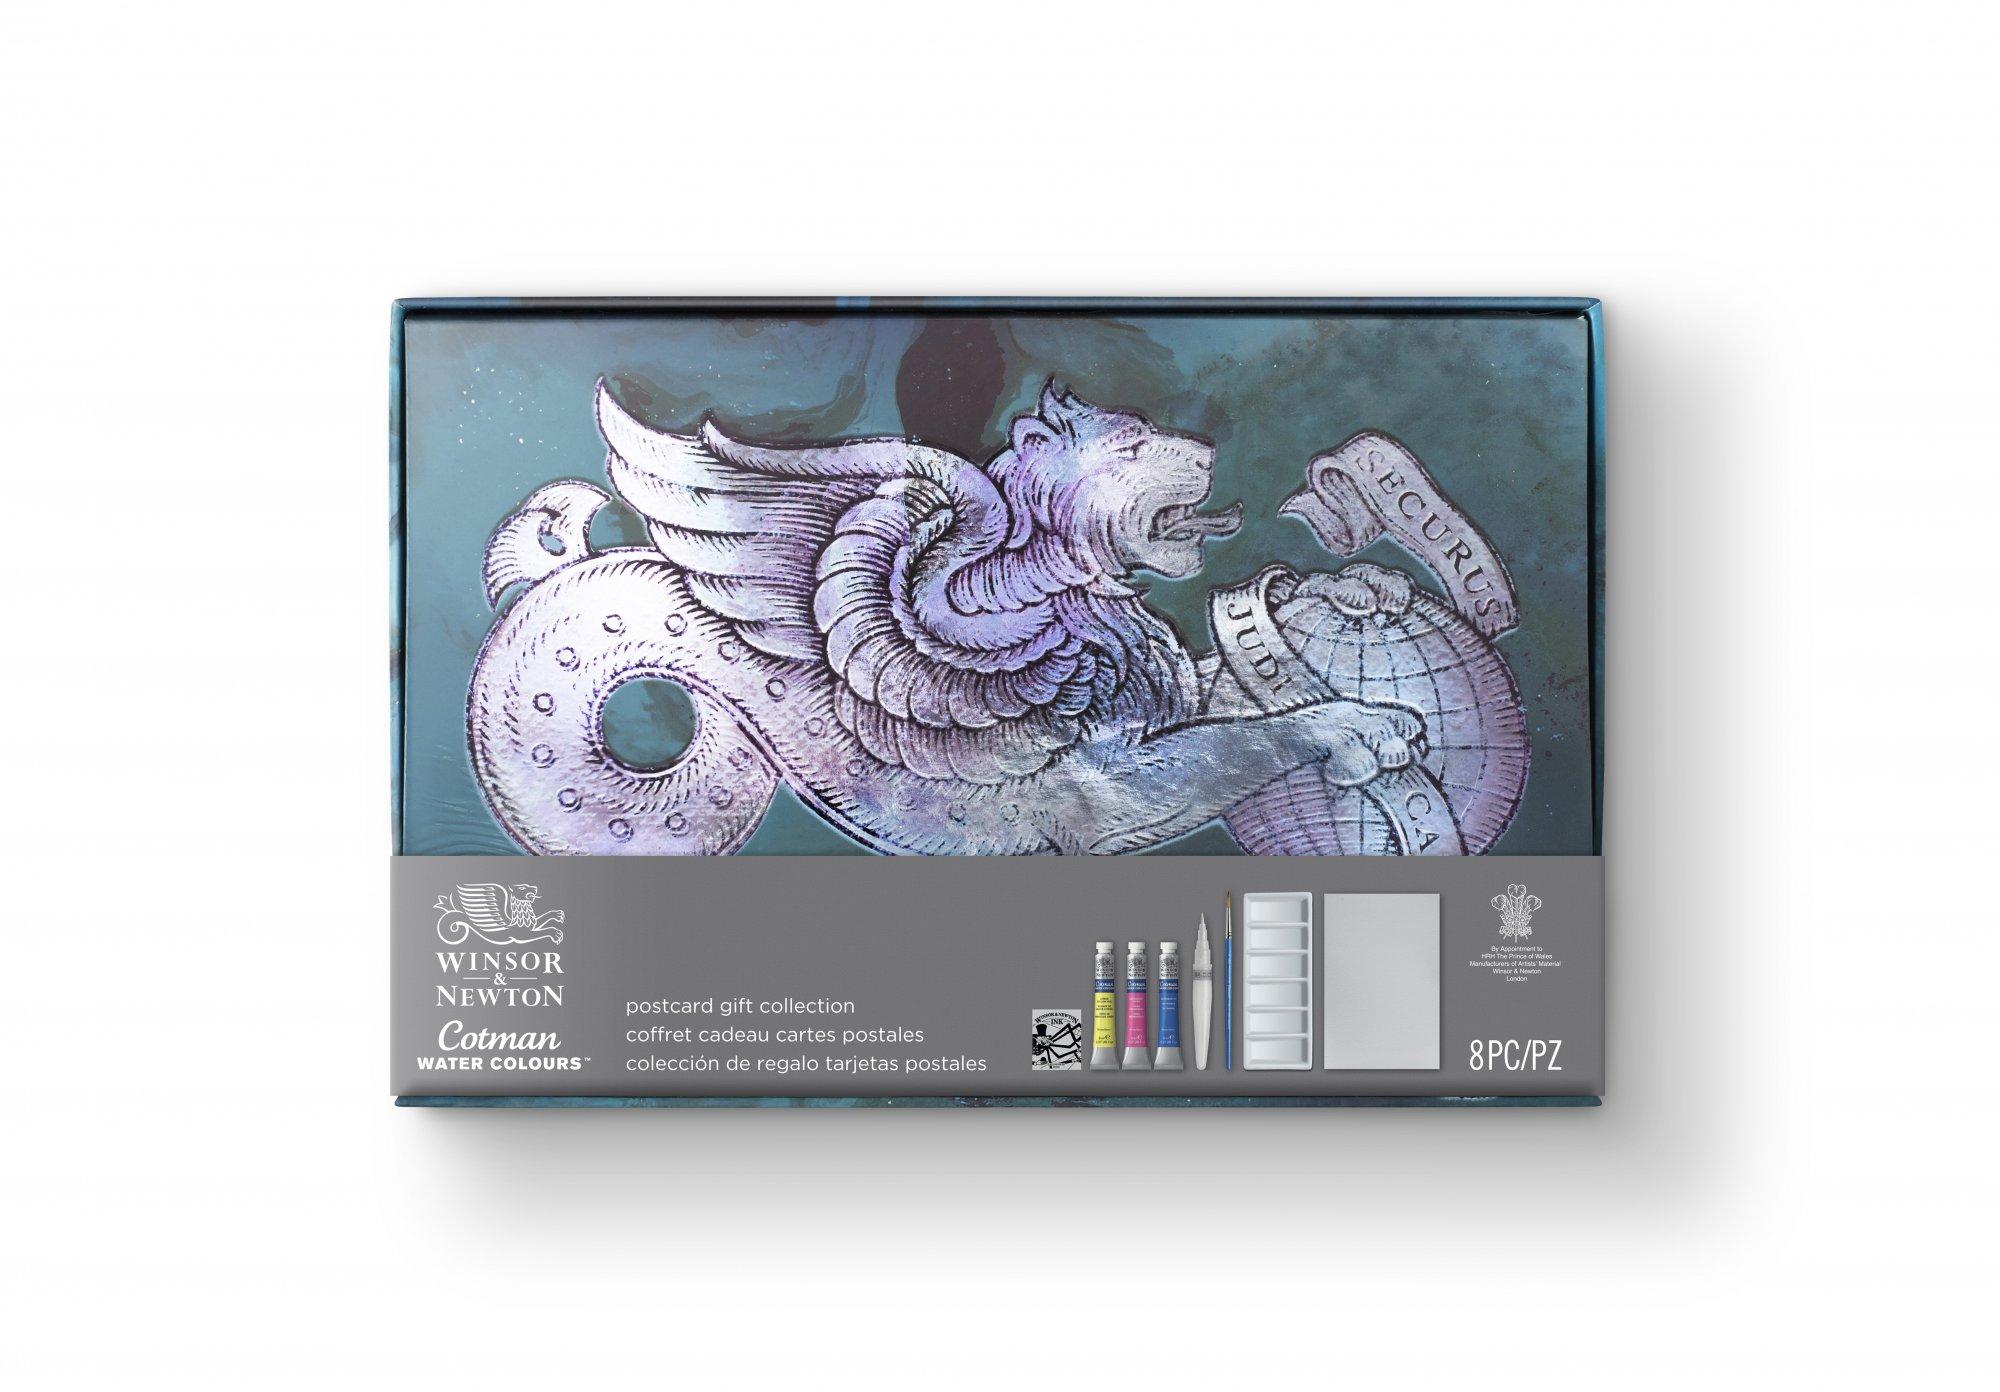 Winsor & Newton Cotman Watercolor Postcard Gift Collection